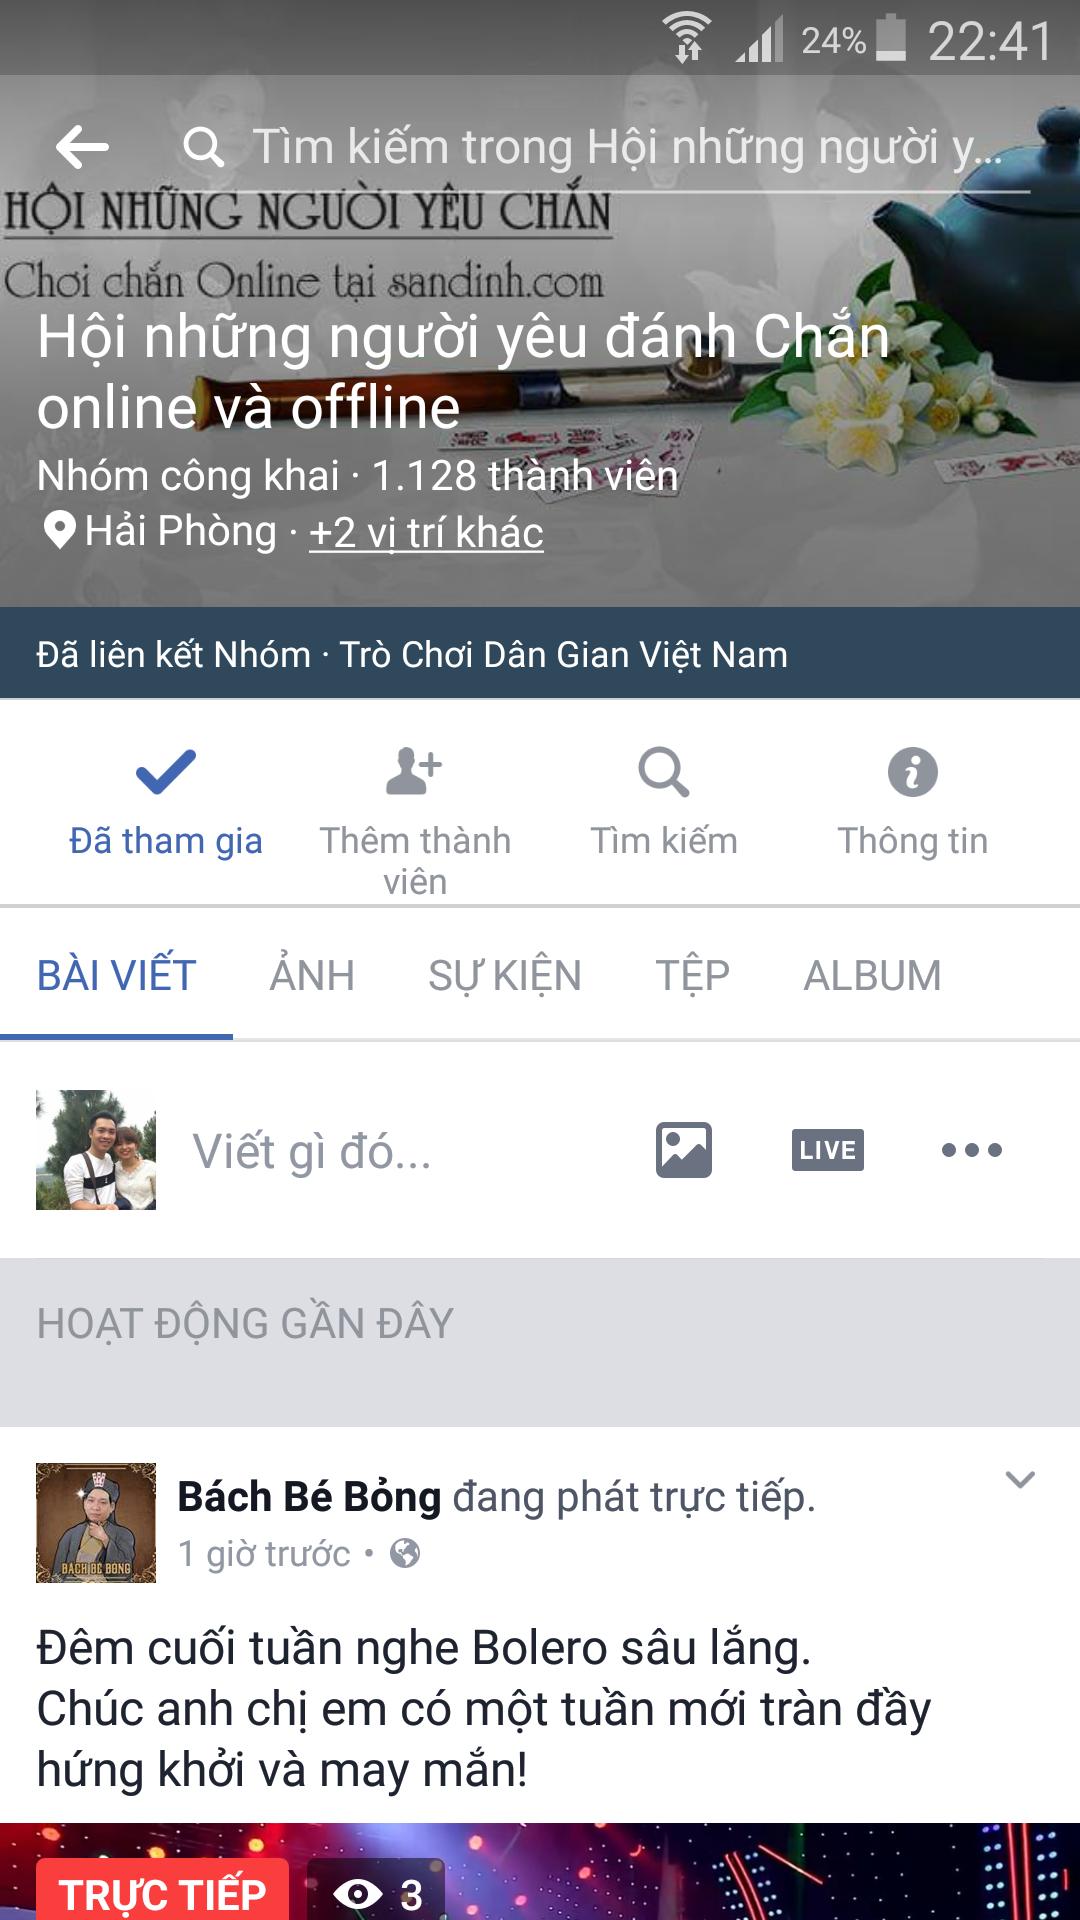 Screenshot_2017-07-16-22-41-06.